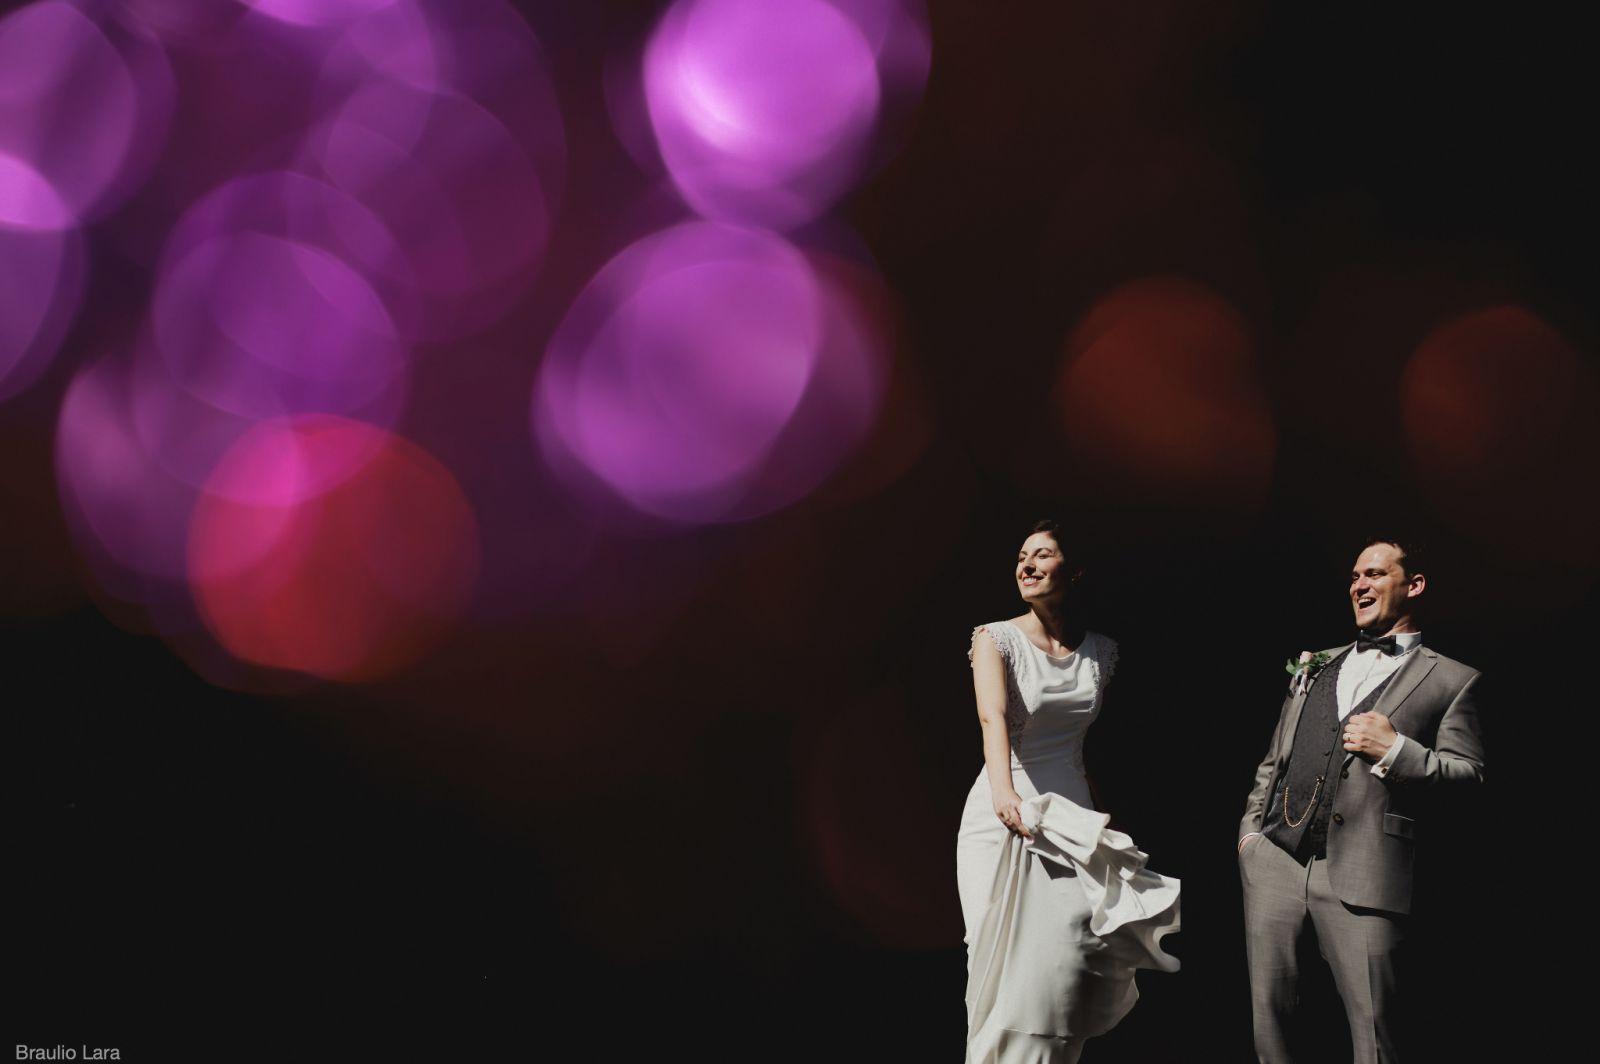 braulio lara wedding photographer brauliolara brauliolaraph fotógrafo de bodas praga praha prague chile arica germany mainz